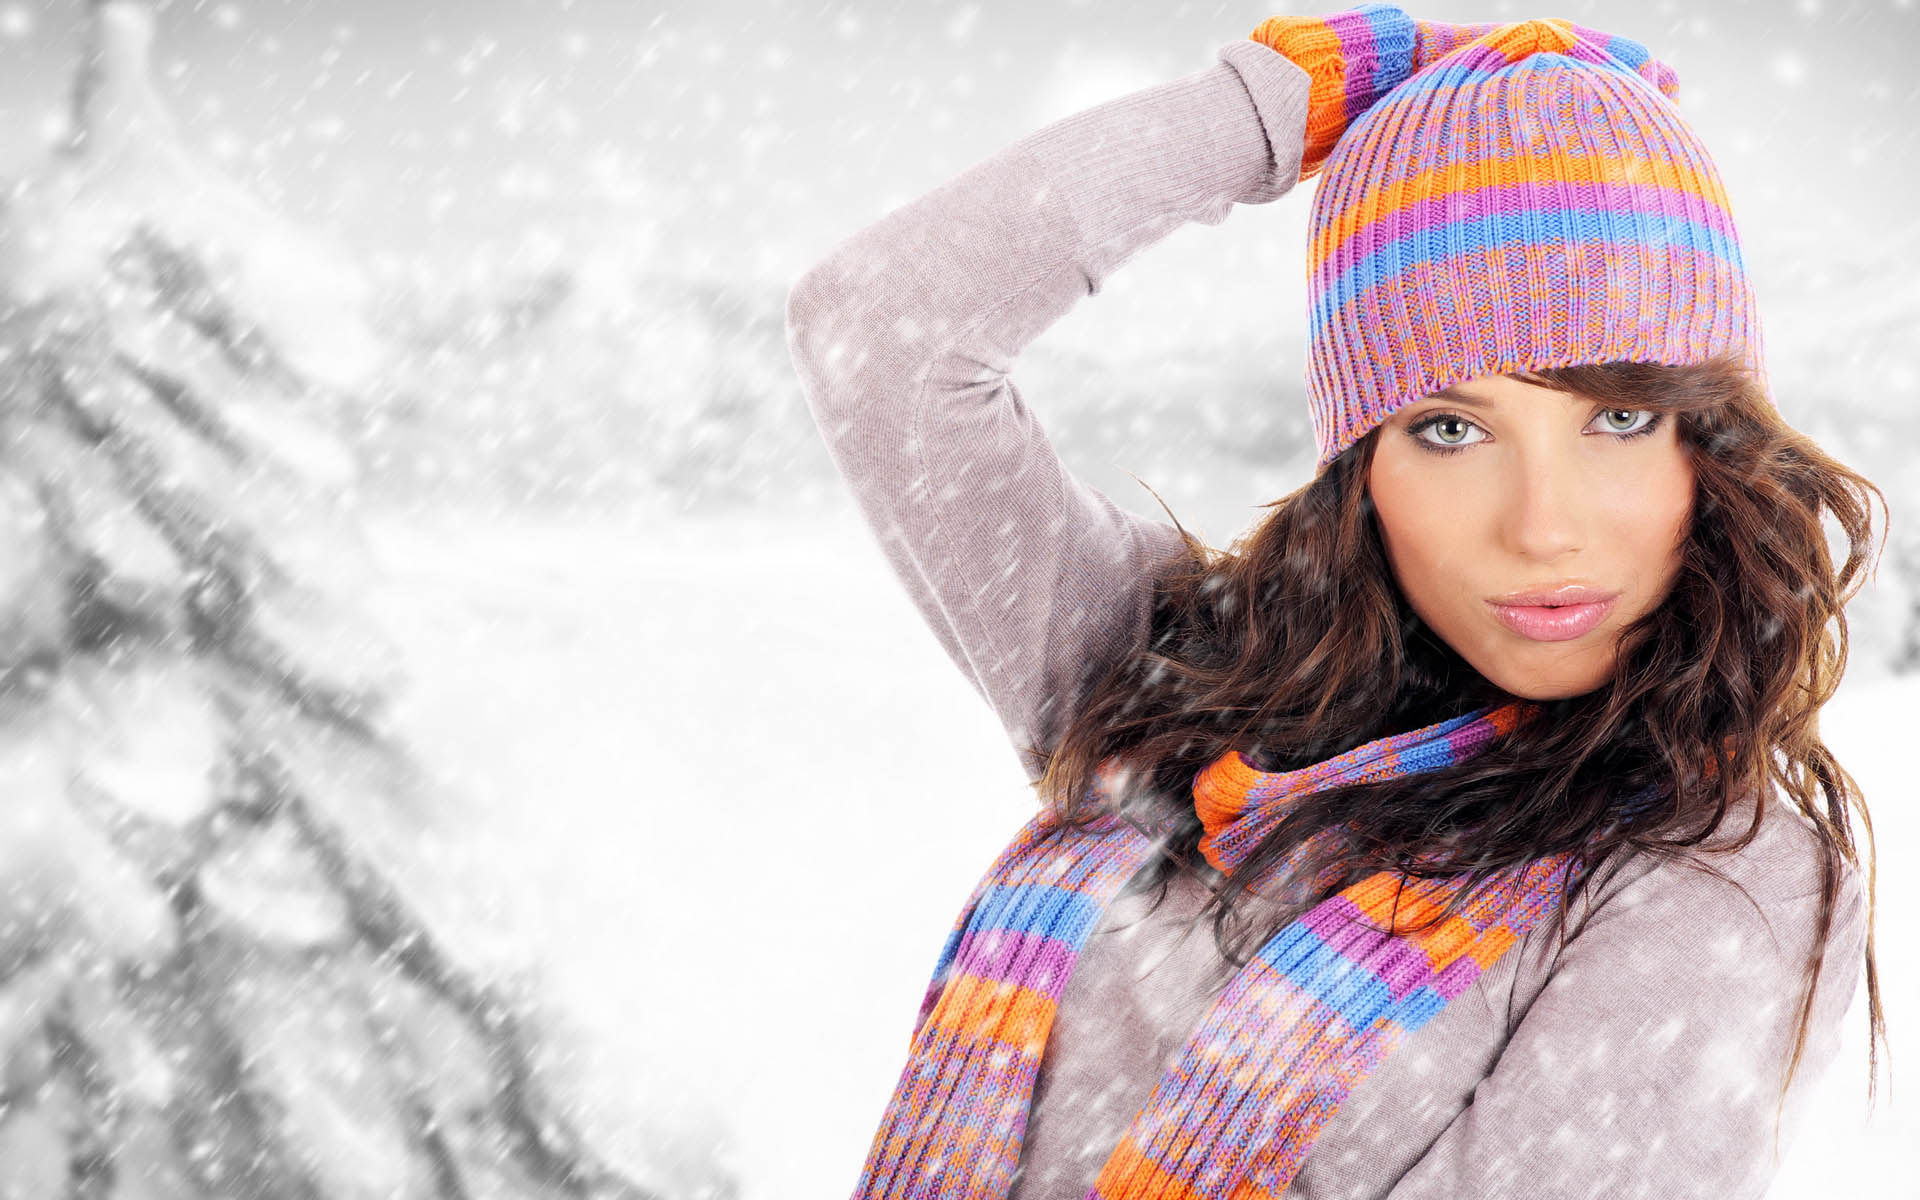 Картинки девушки зимой в снегу